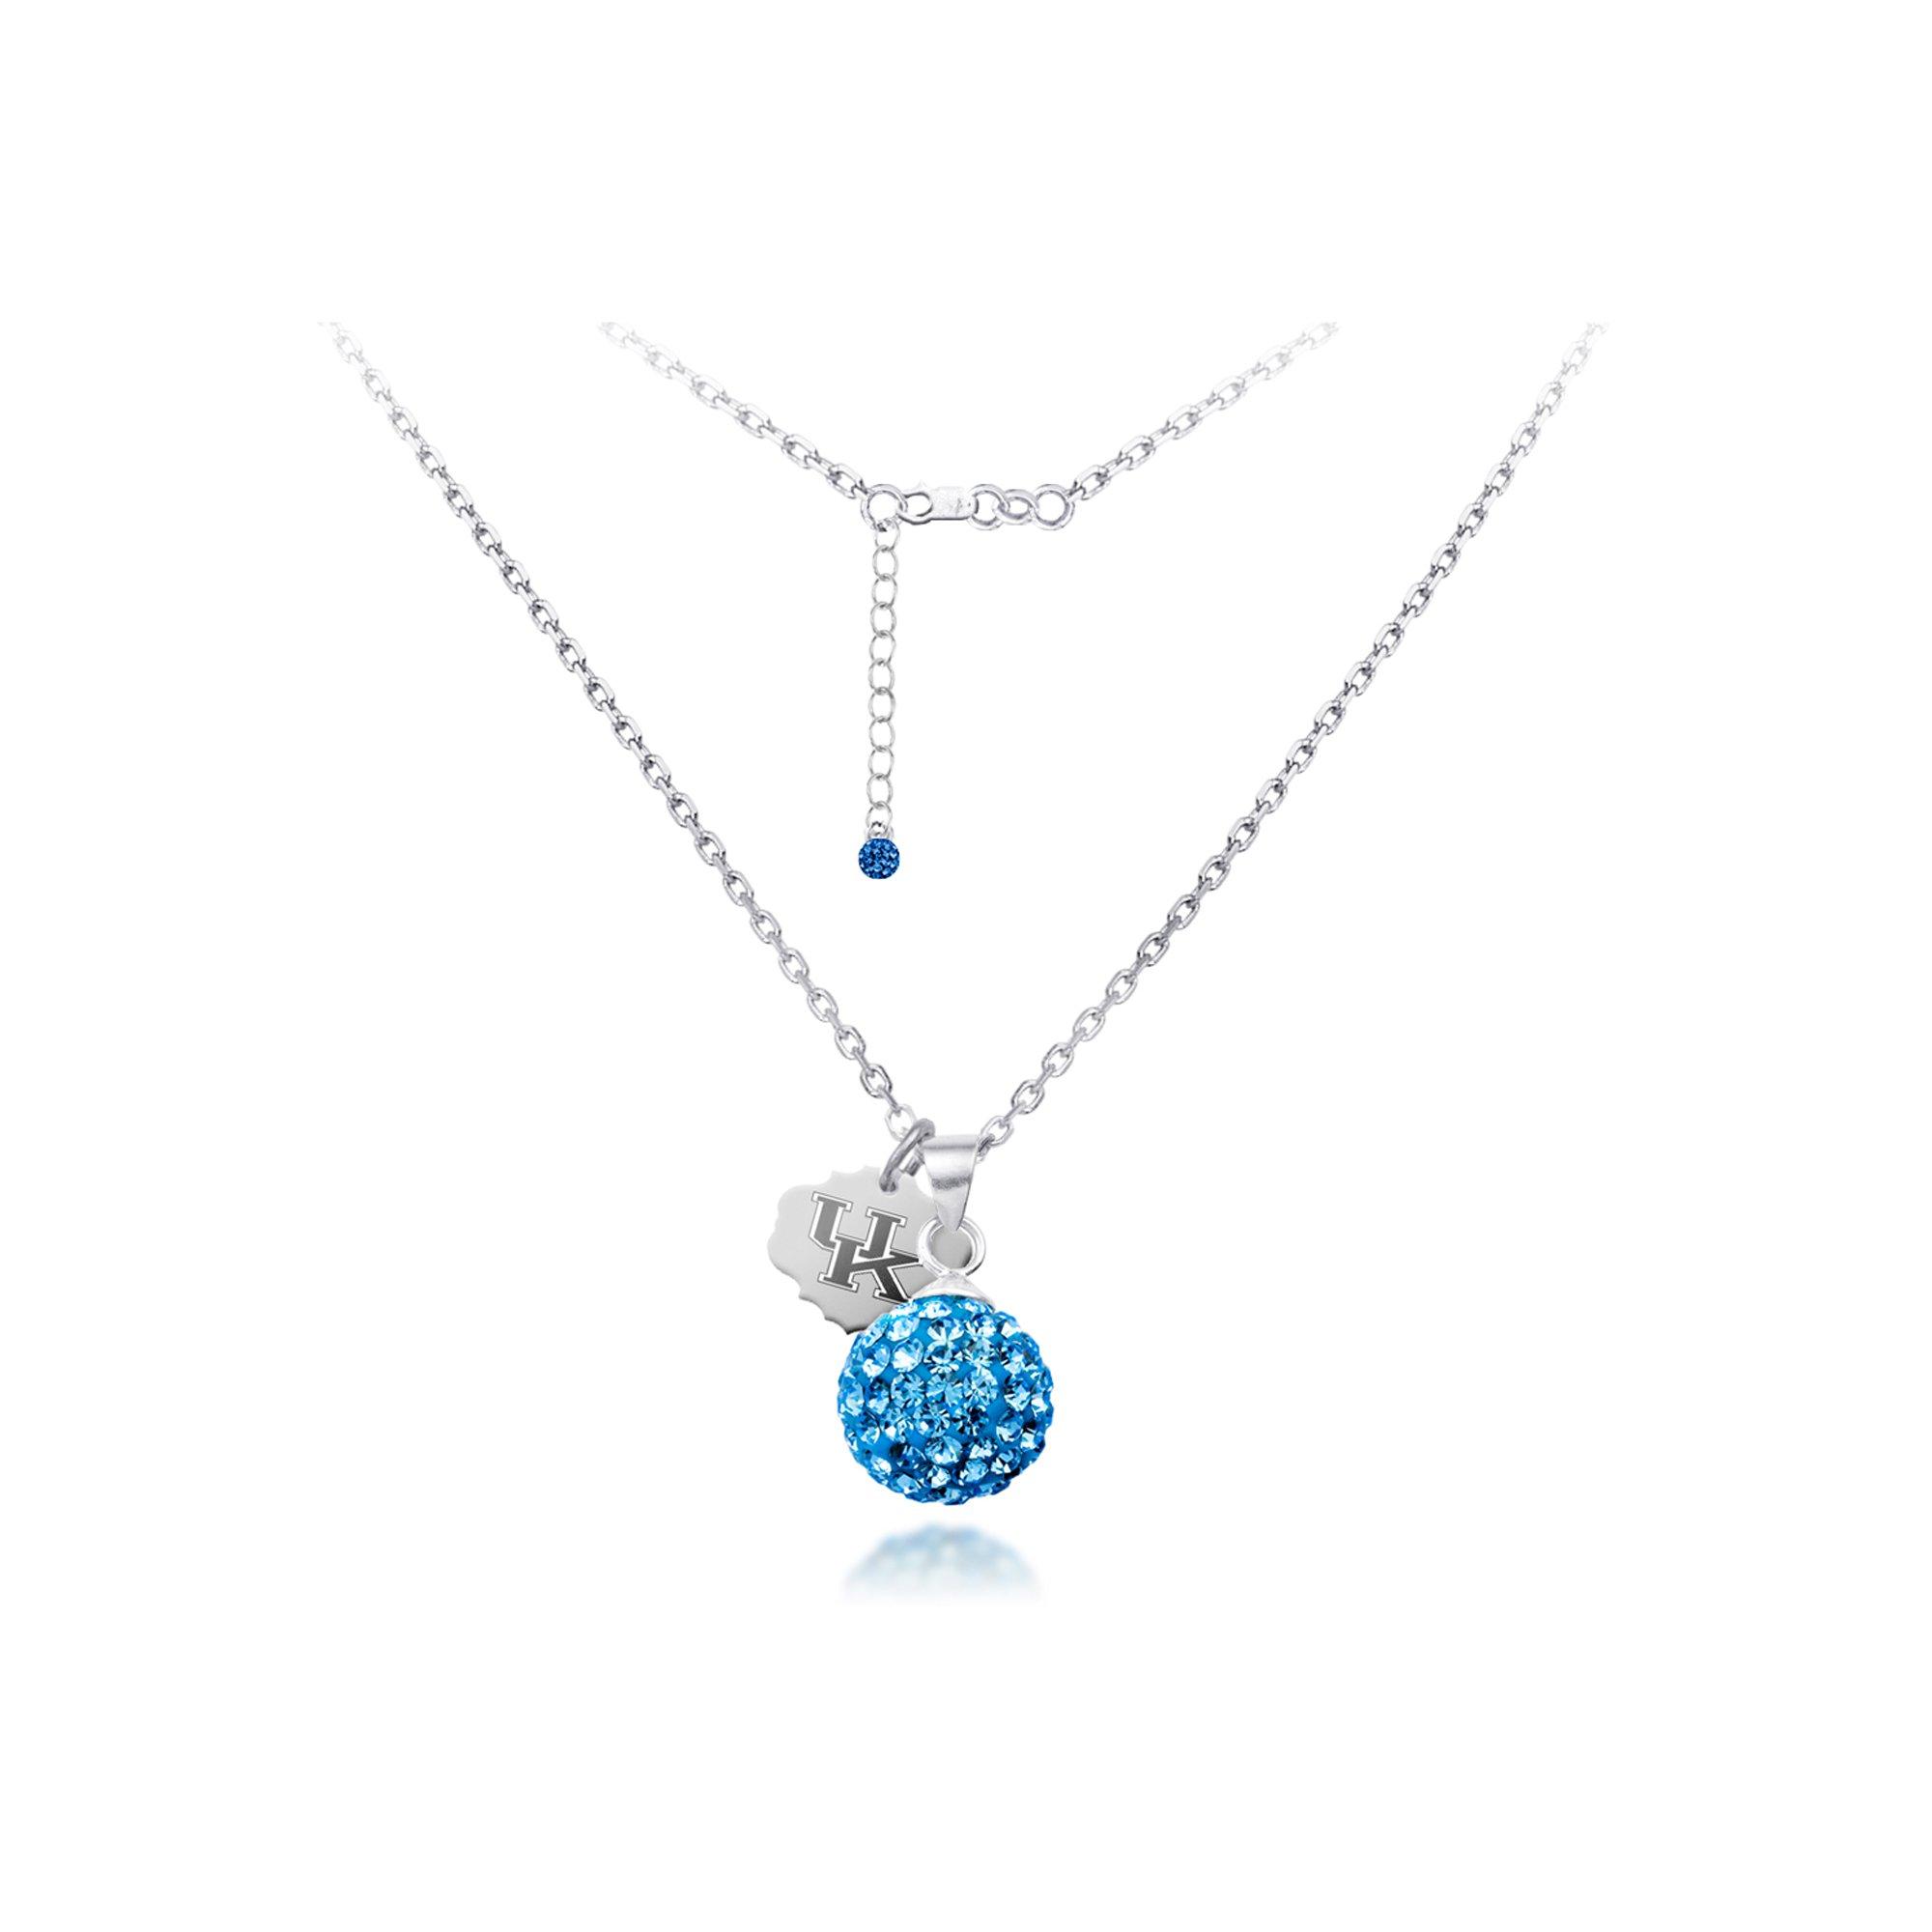 DiamondJewelryNY Silver Pendant, Spirit Sphere Neck/Univ Of Kentucky